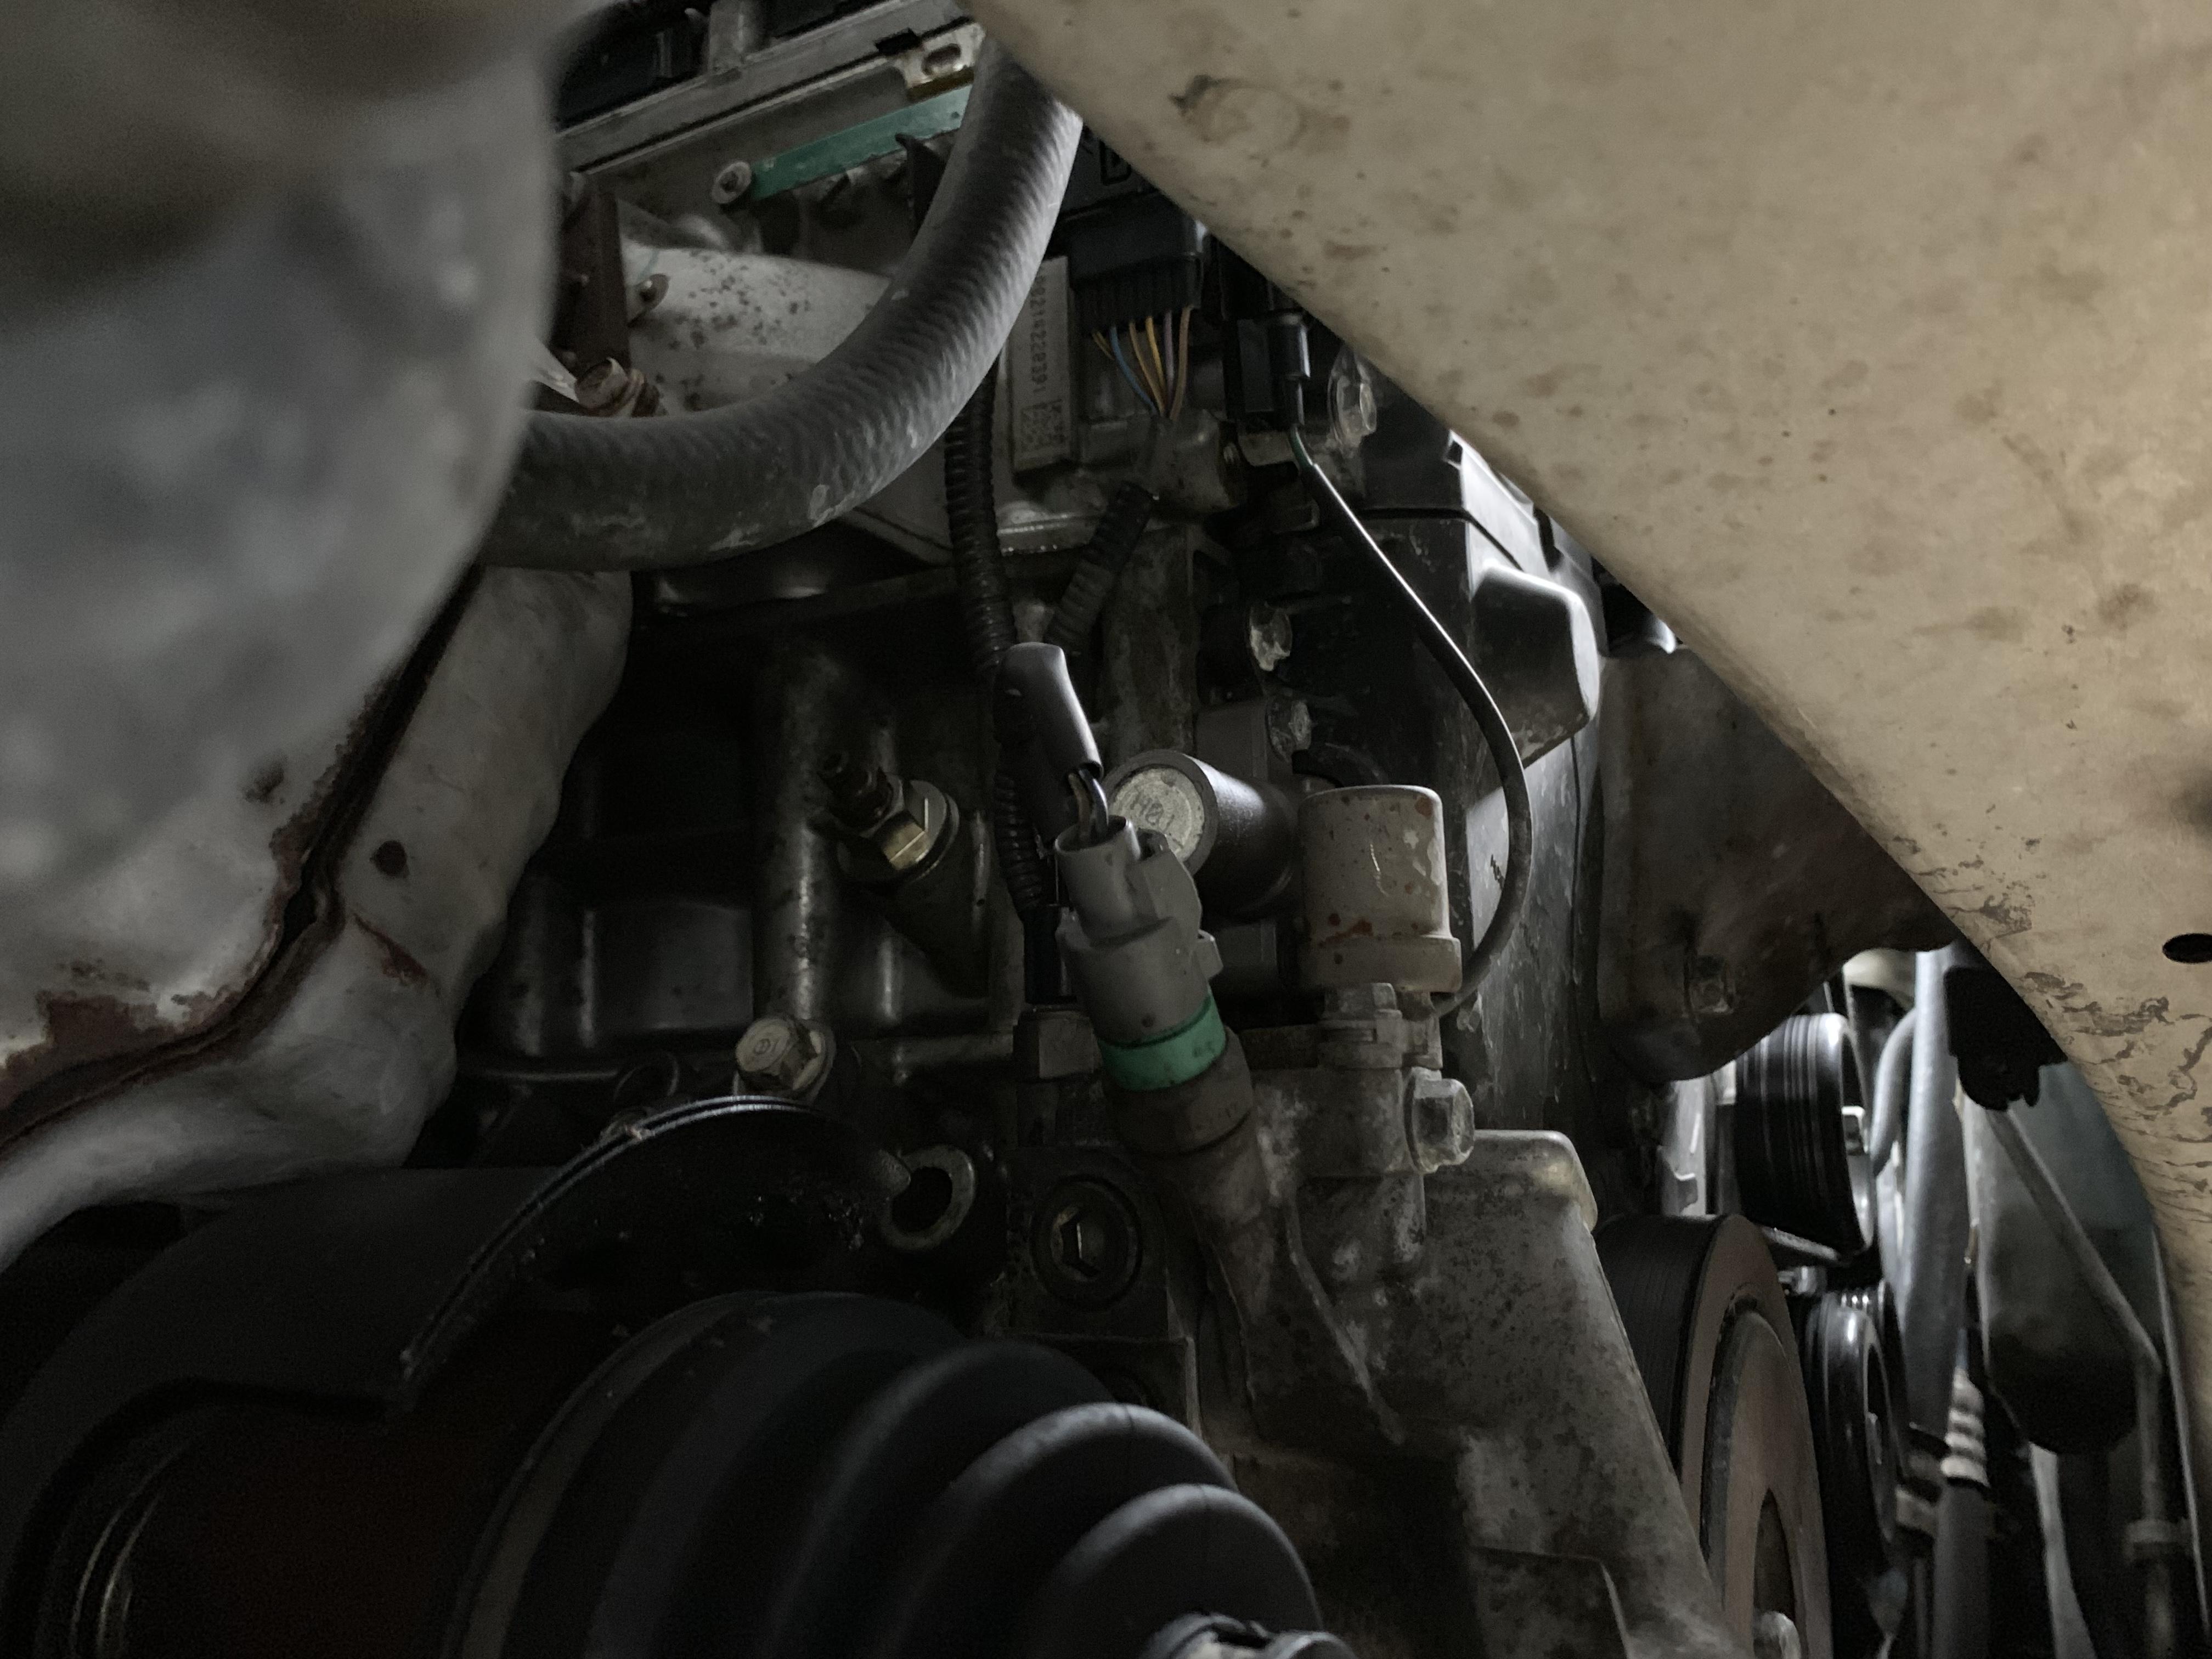 Oil Leak after Oil Pump Reseal-8628bde7-d0da-4616-bfbb-a18ff4cc93c4_1555668419271.jpeg